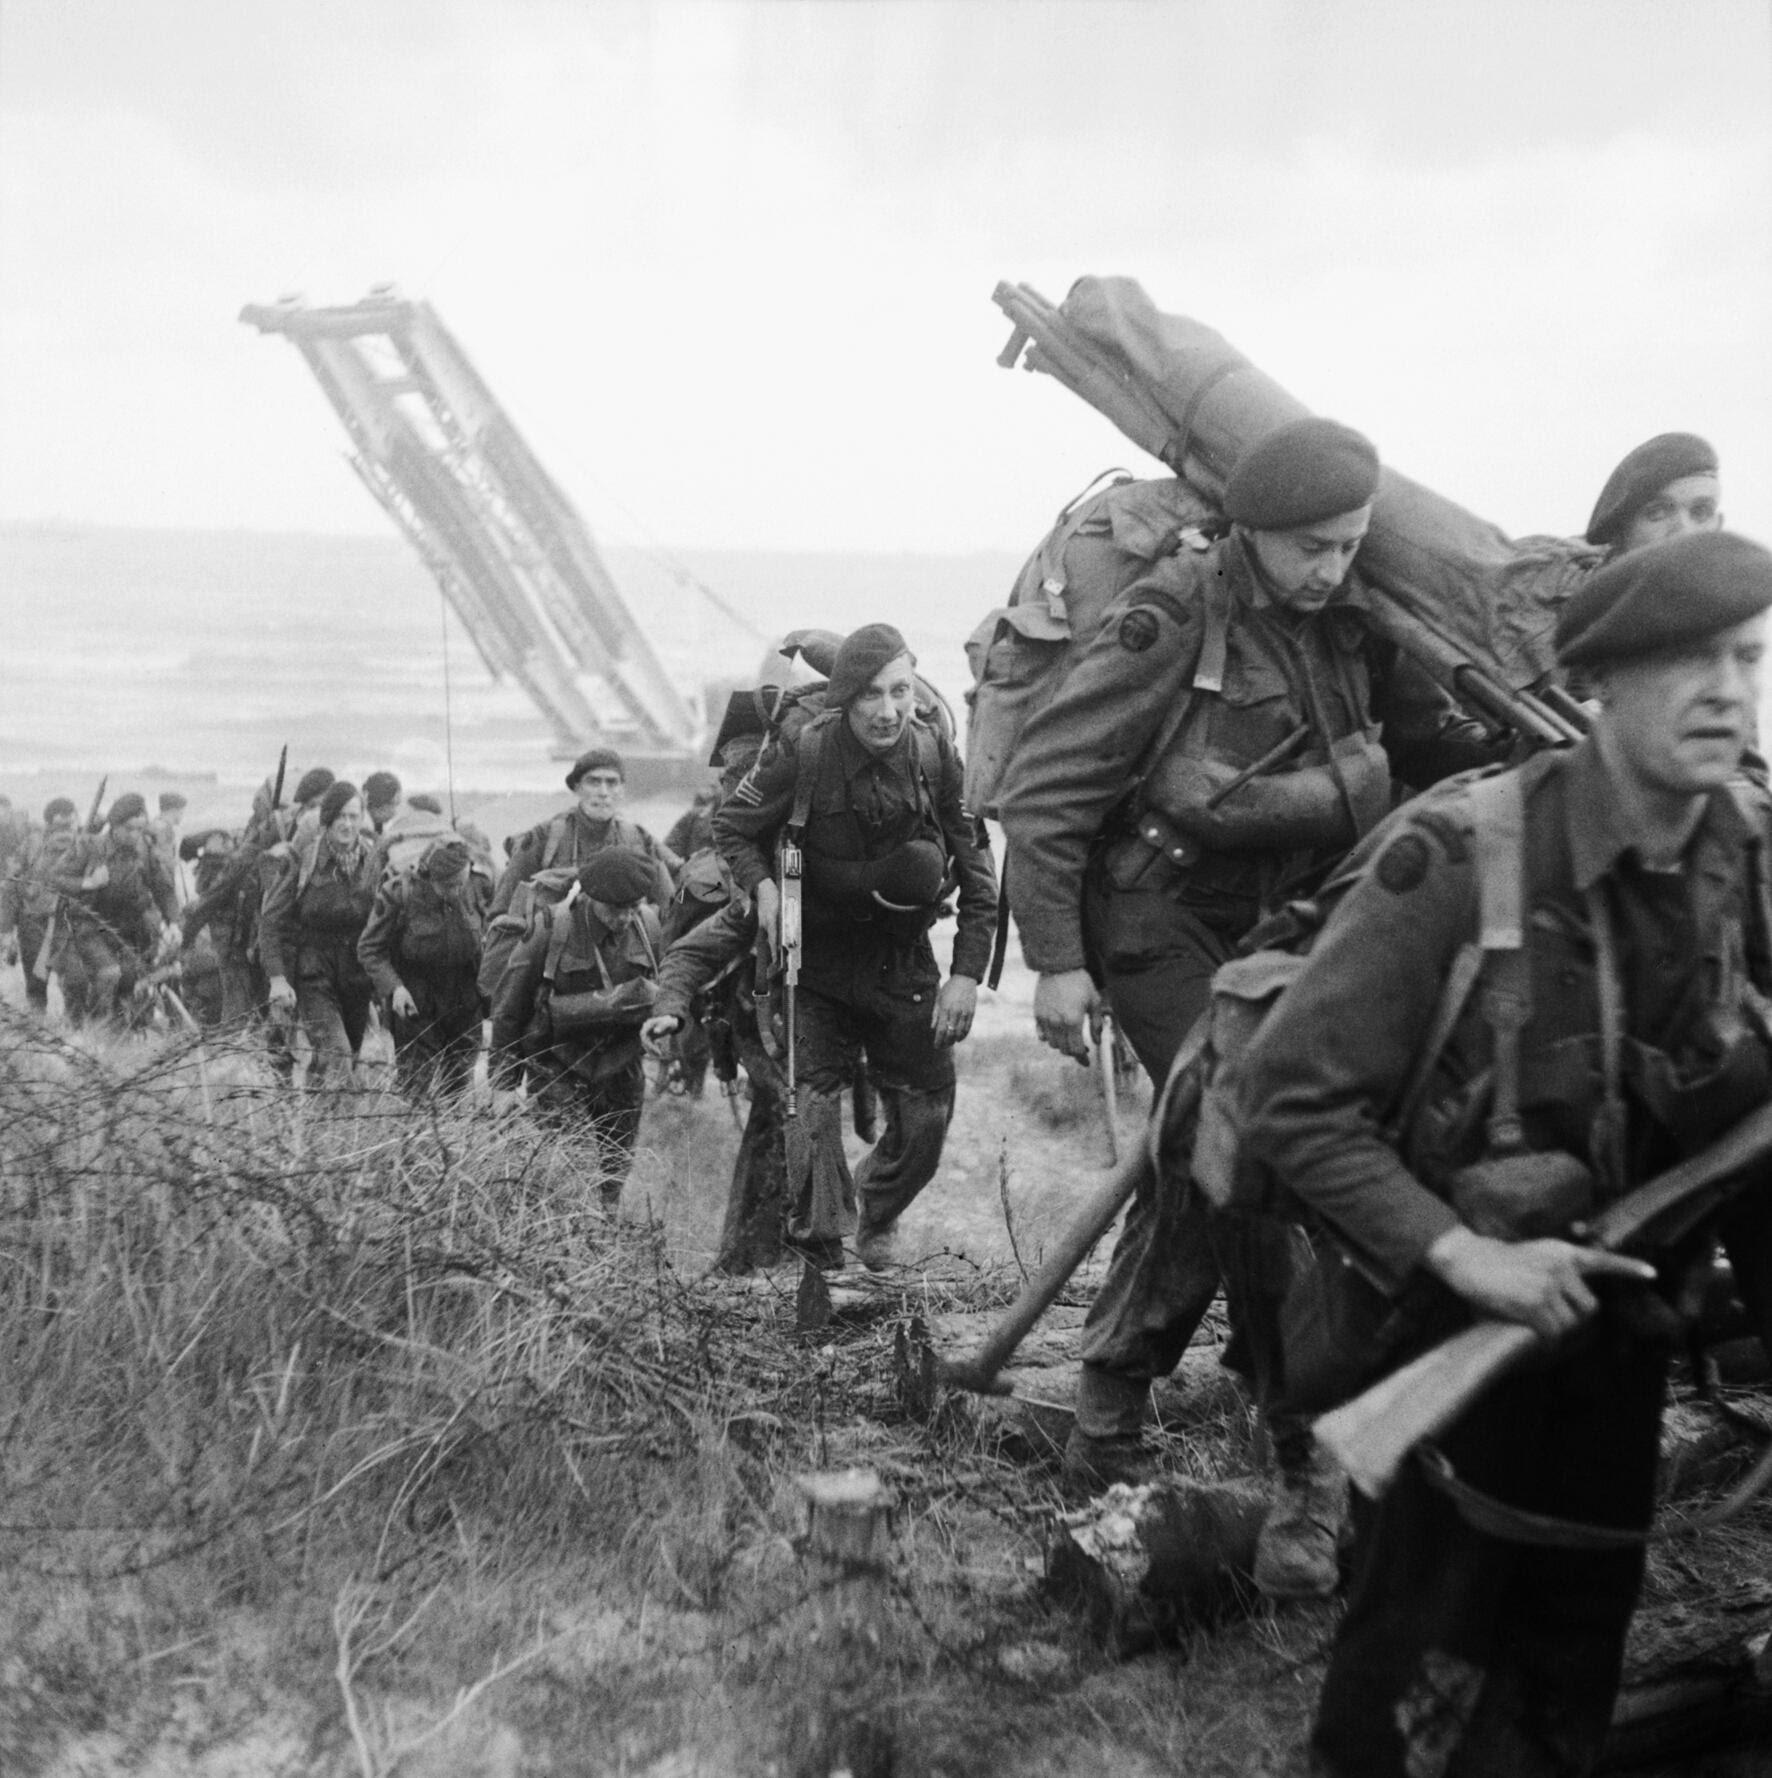 D-Day Landing at Sword Beach - Discerning History